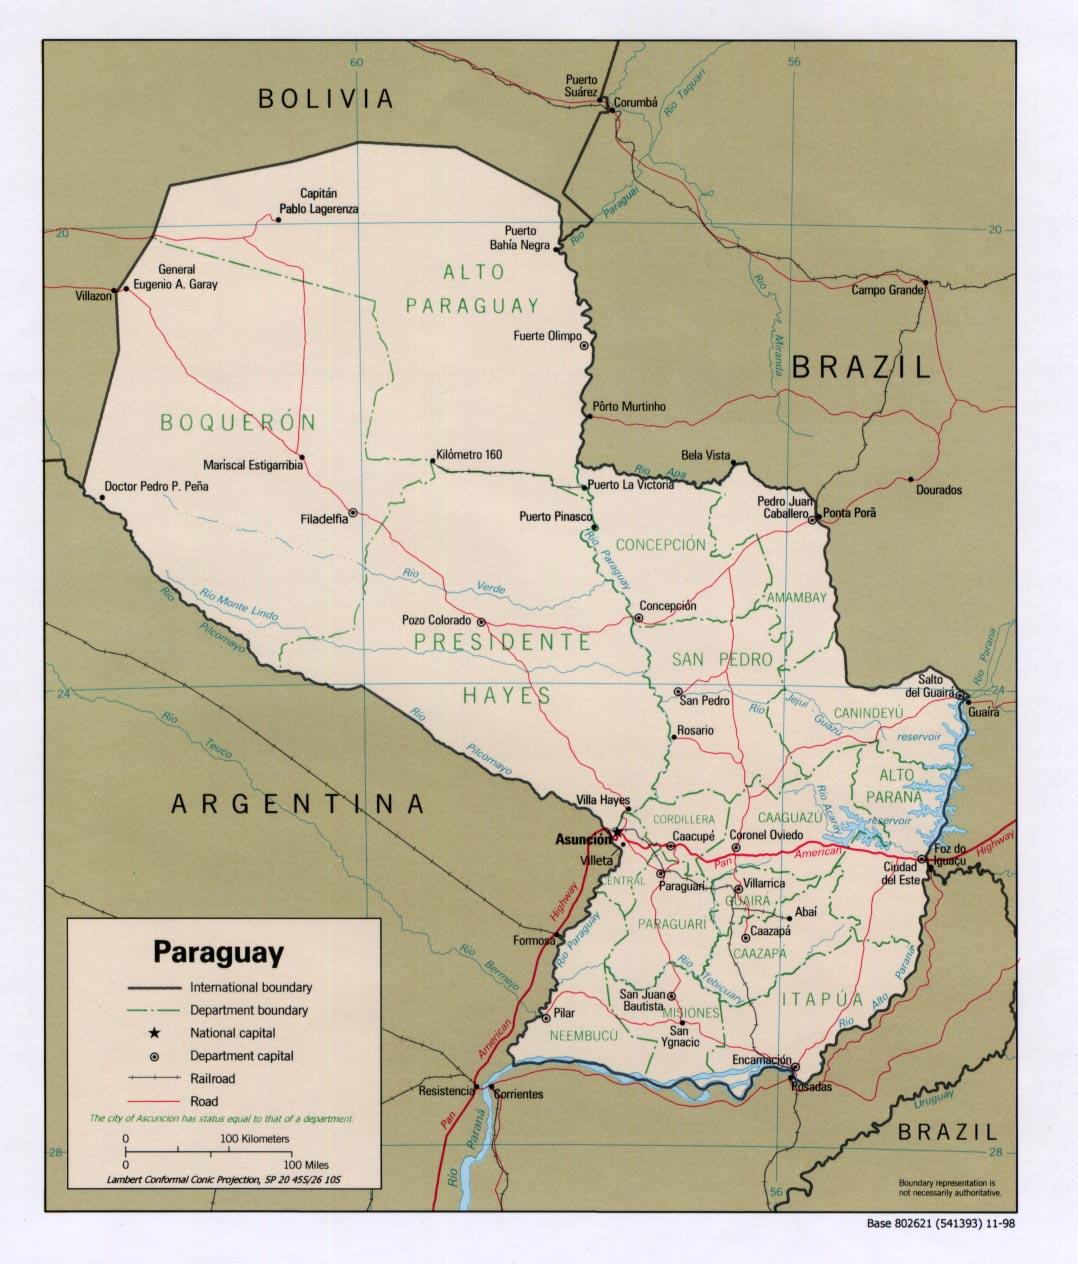 Paraguay - relief